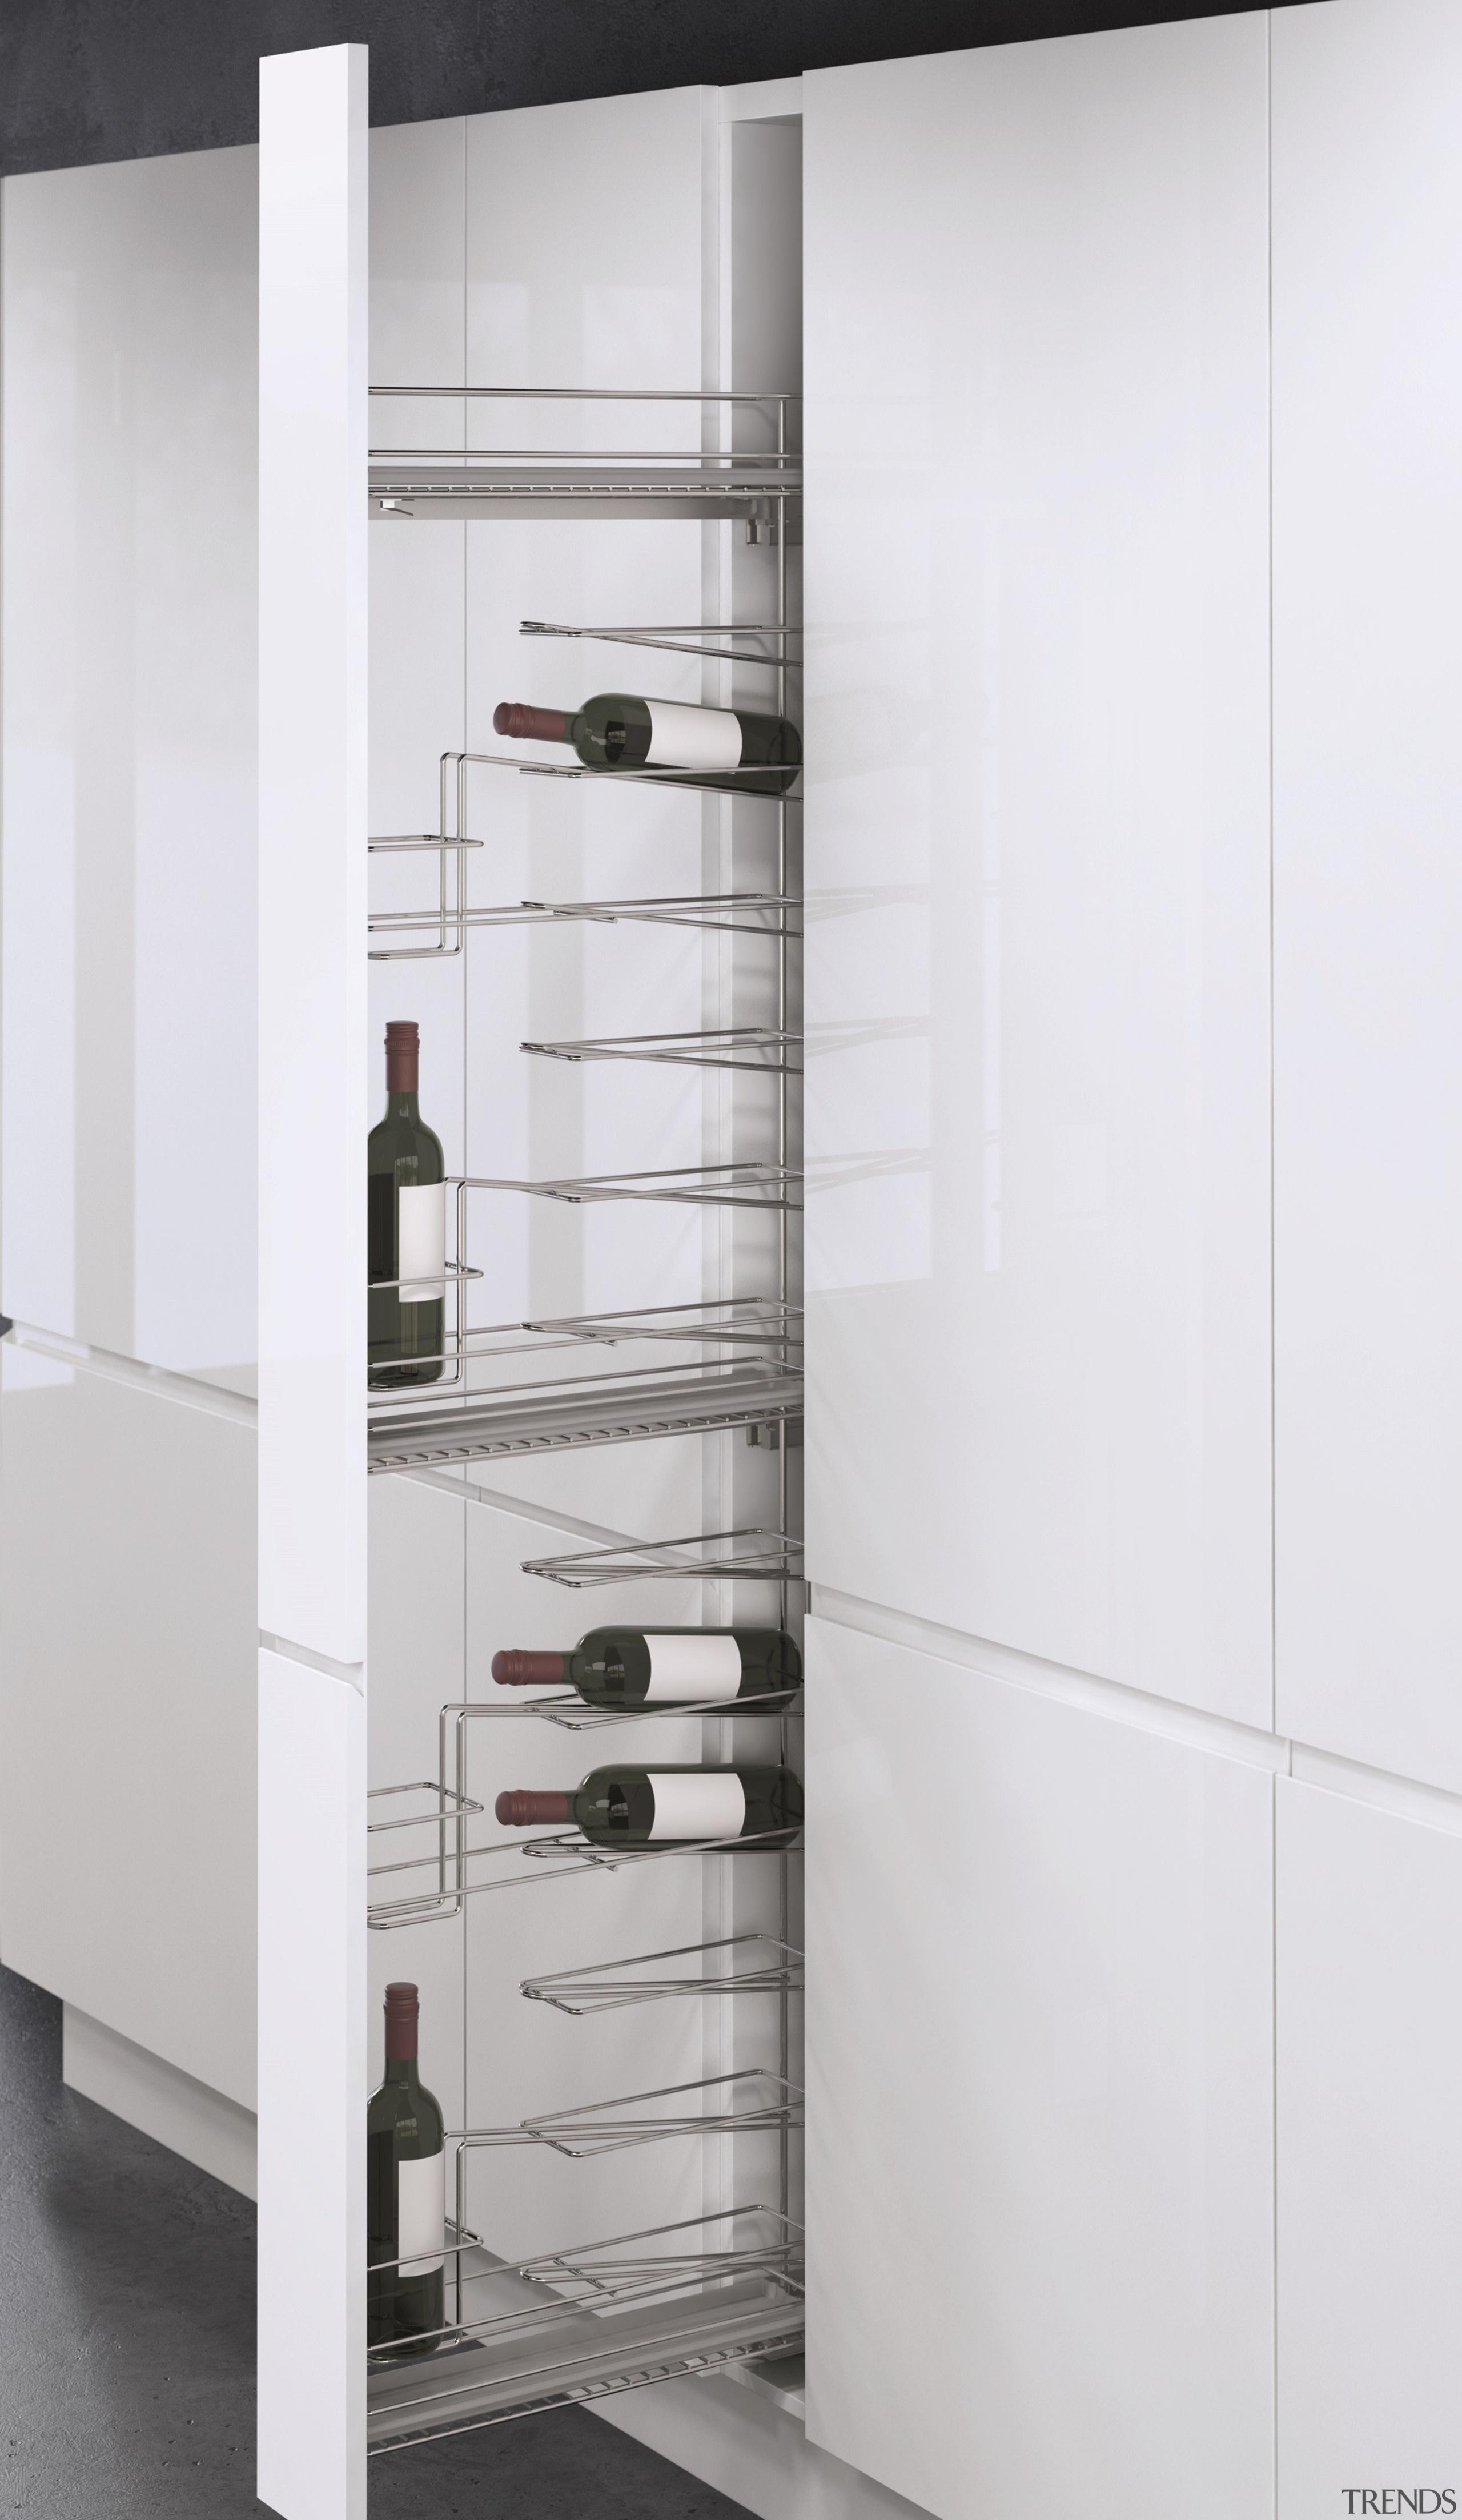 Vauth-Sagel's VS TAL WIRO Rack 15 & Bottle bathroom accessory, furniture, product, wardrobe, white, gray